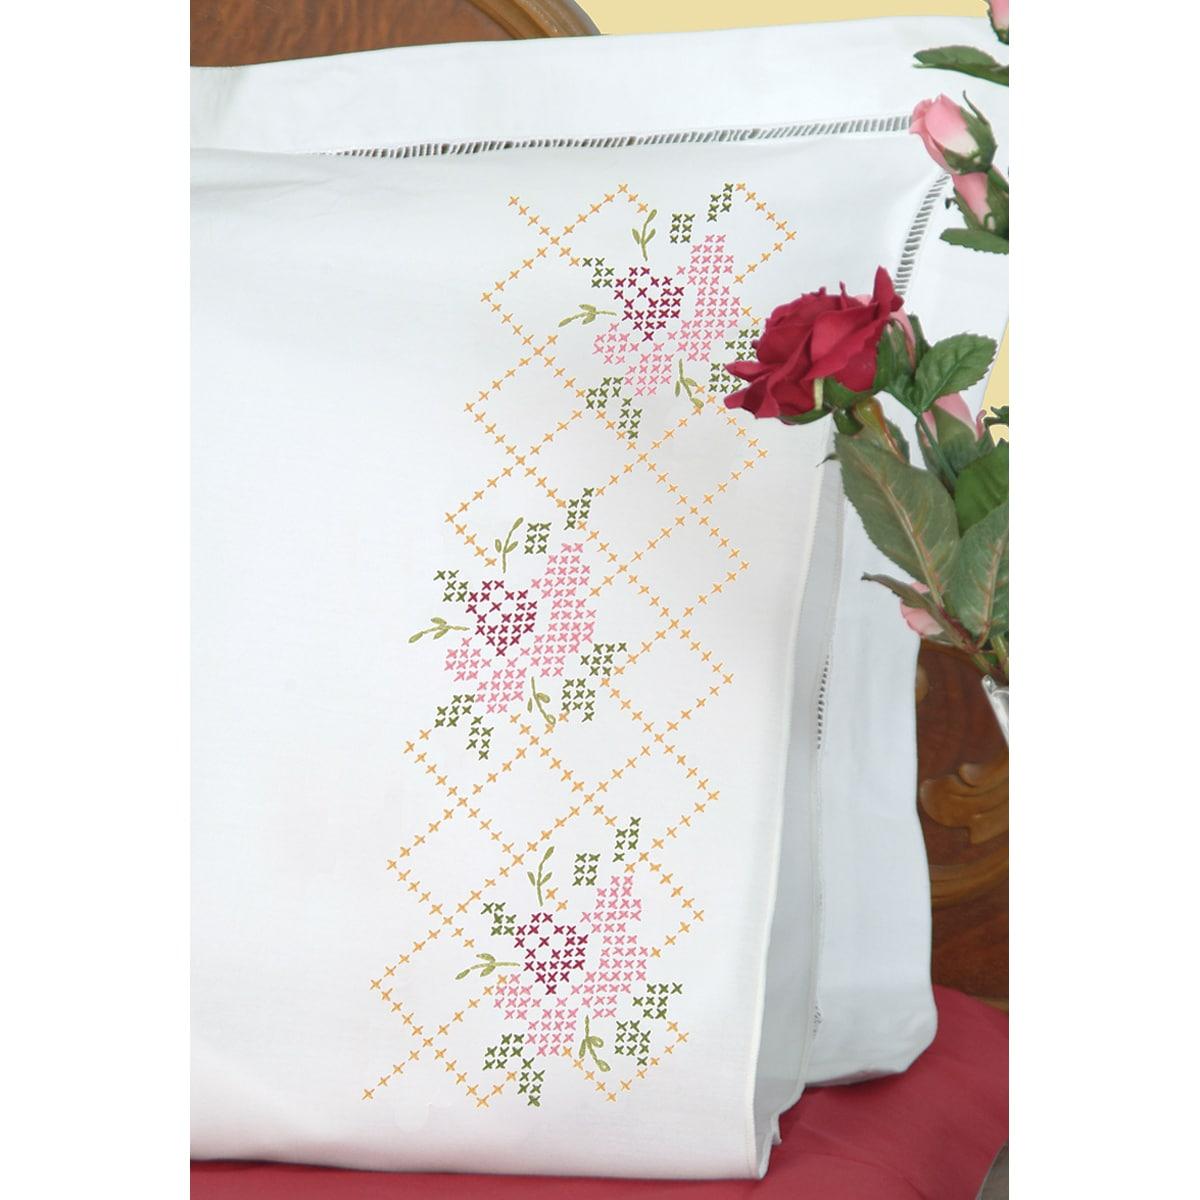 Stamped Pillowcases With White Perle Edge 2/Pkg-Rose Lattice